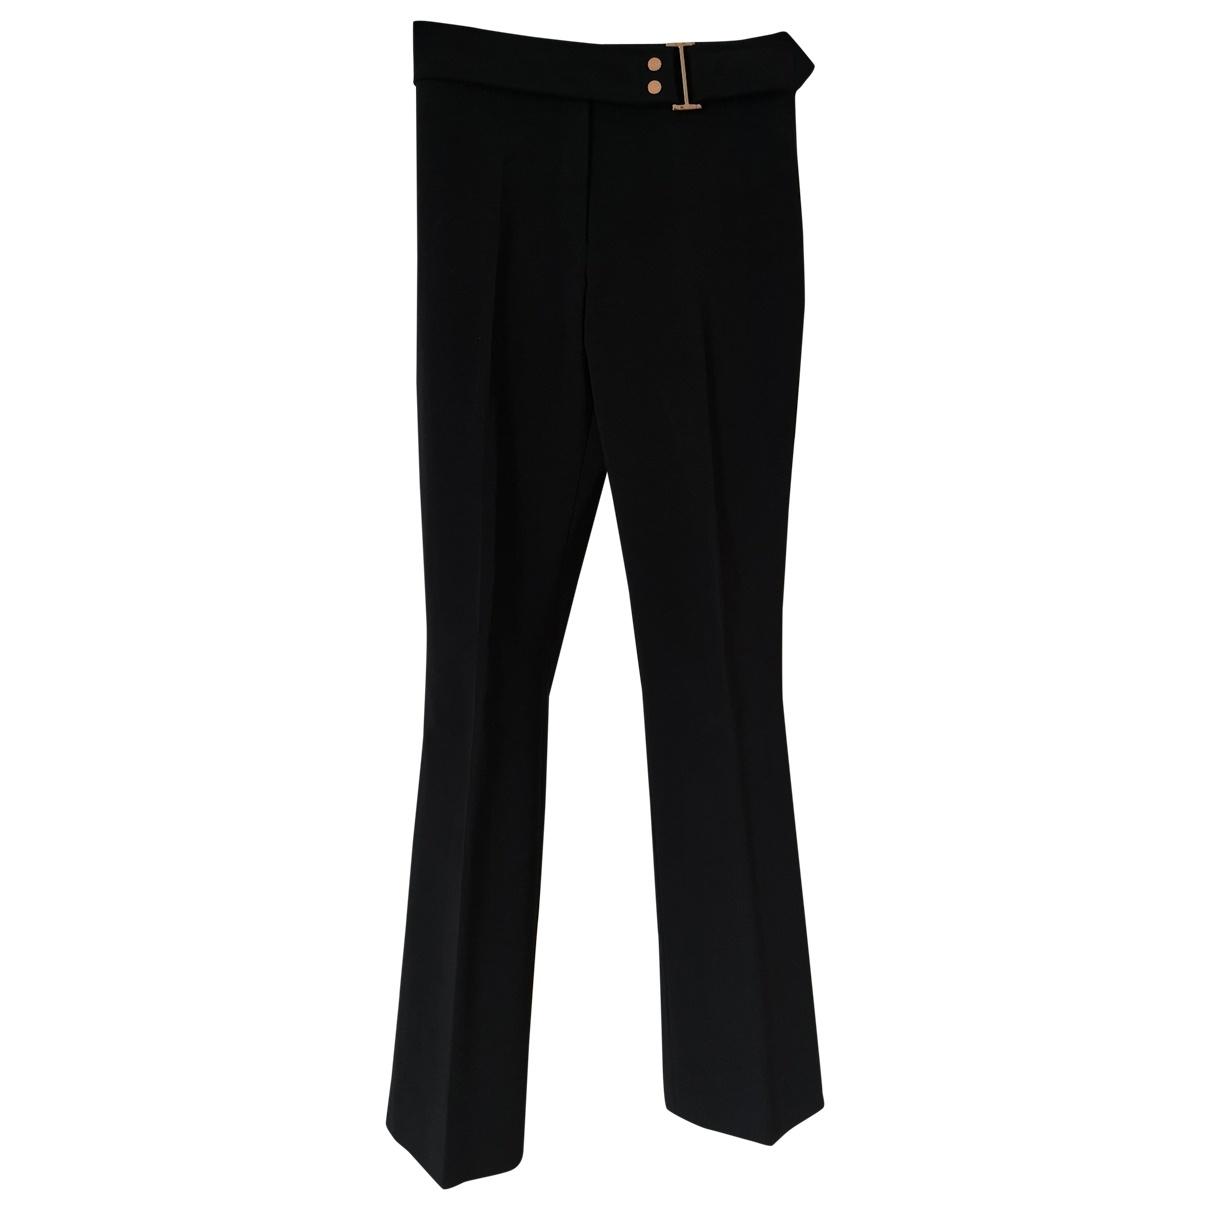 Karen Millen \N Black Trousers for Women 8 UK